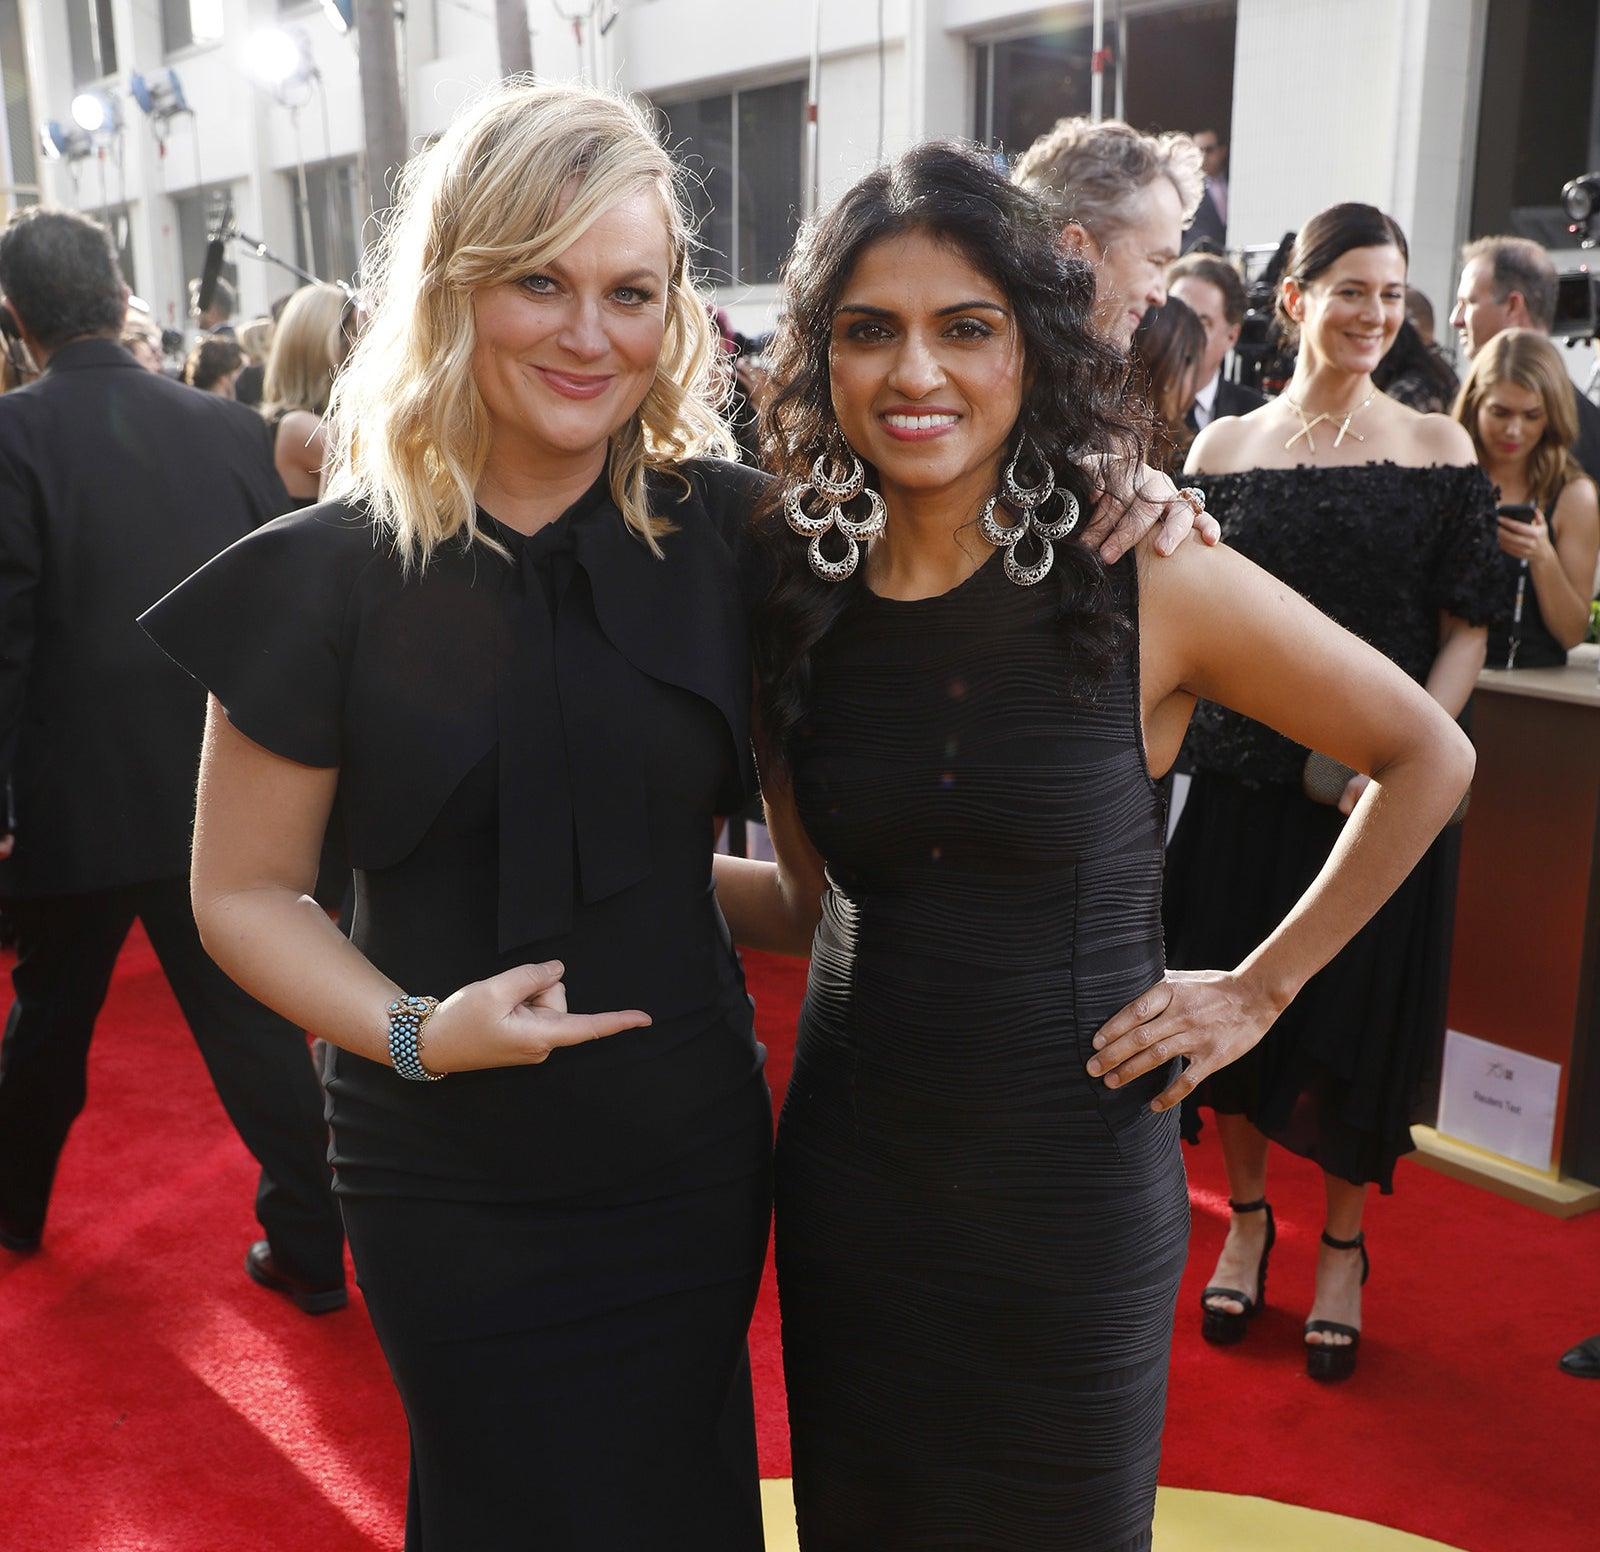 Amy Poehler and Saru Jayaraman at the Golden Globe Awards in January 2018.